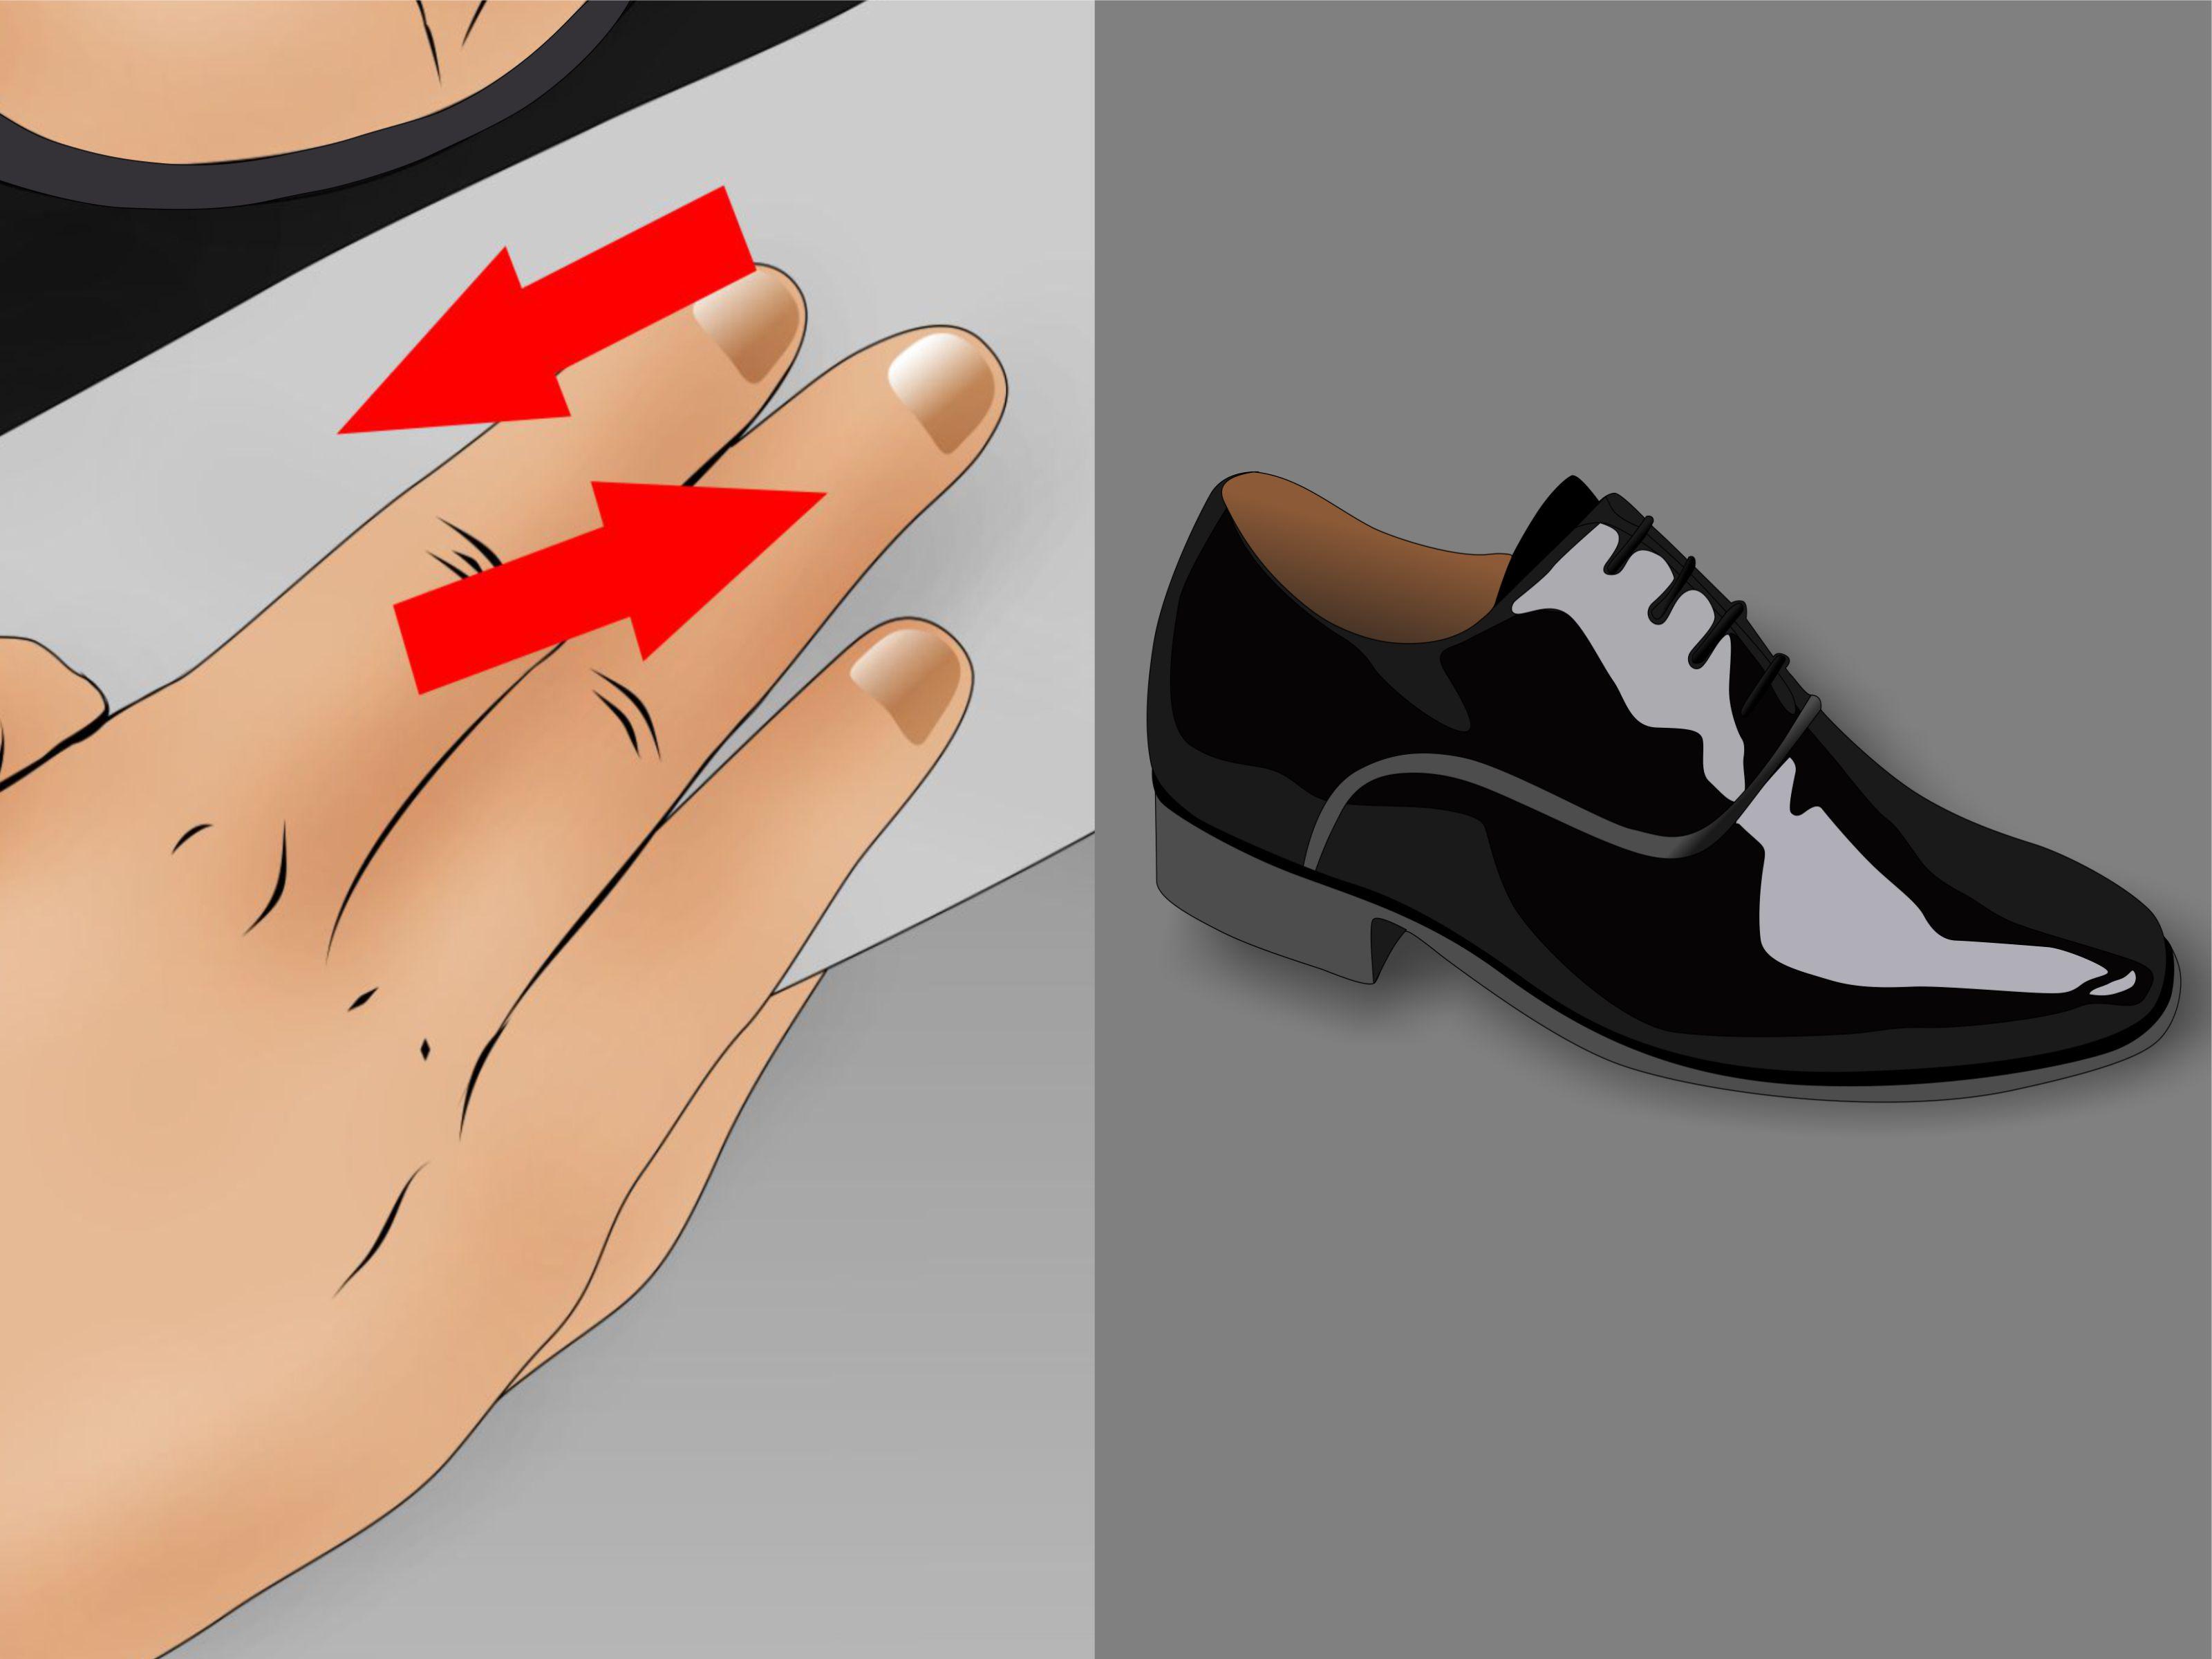 3 Ways to Shine Shoes  wikiHow